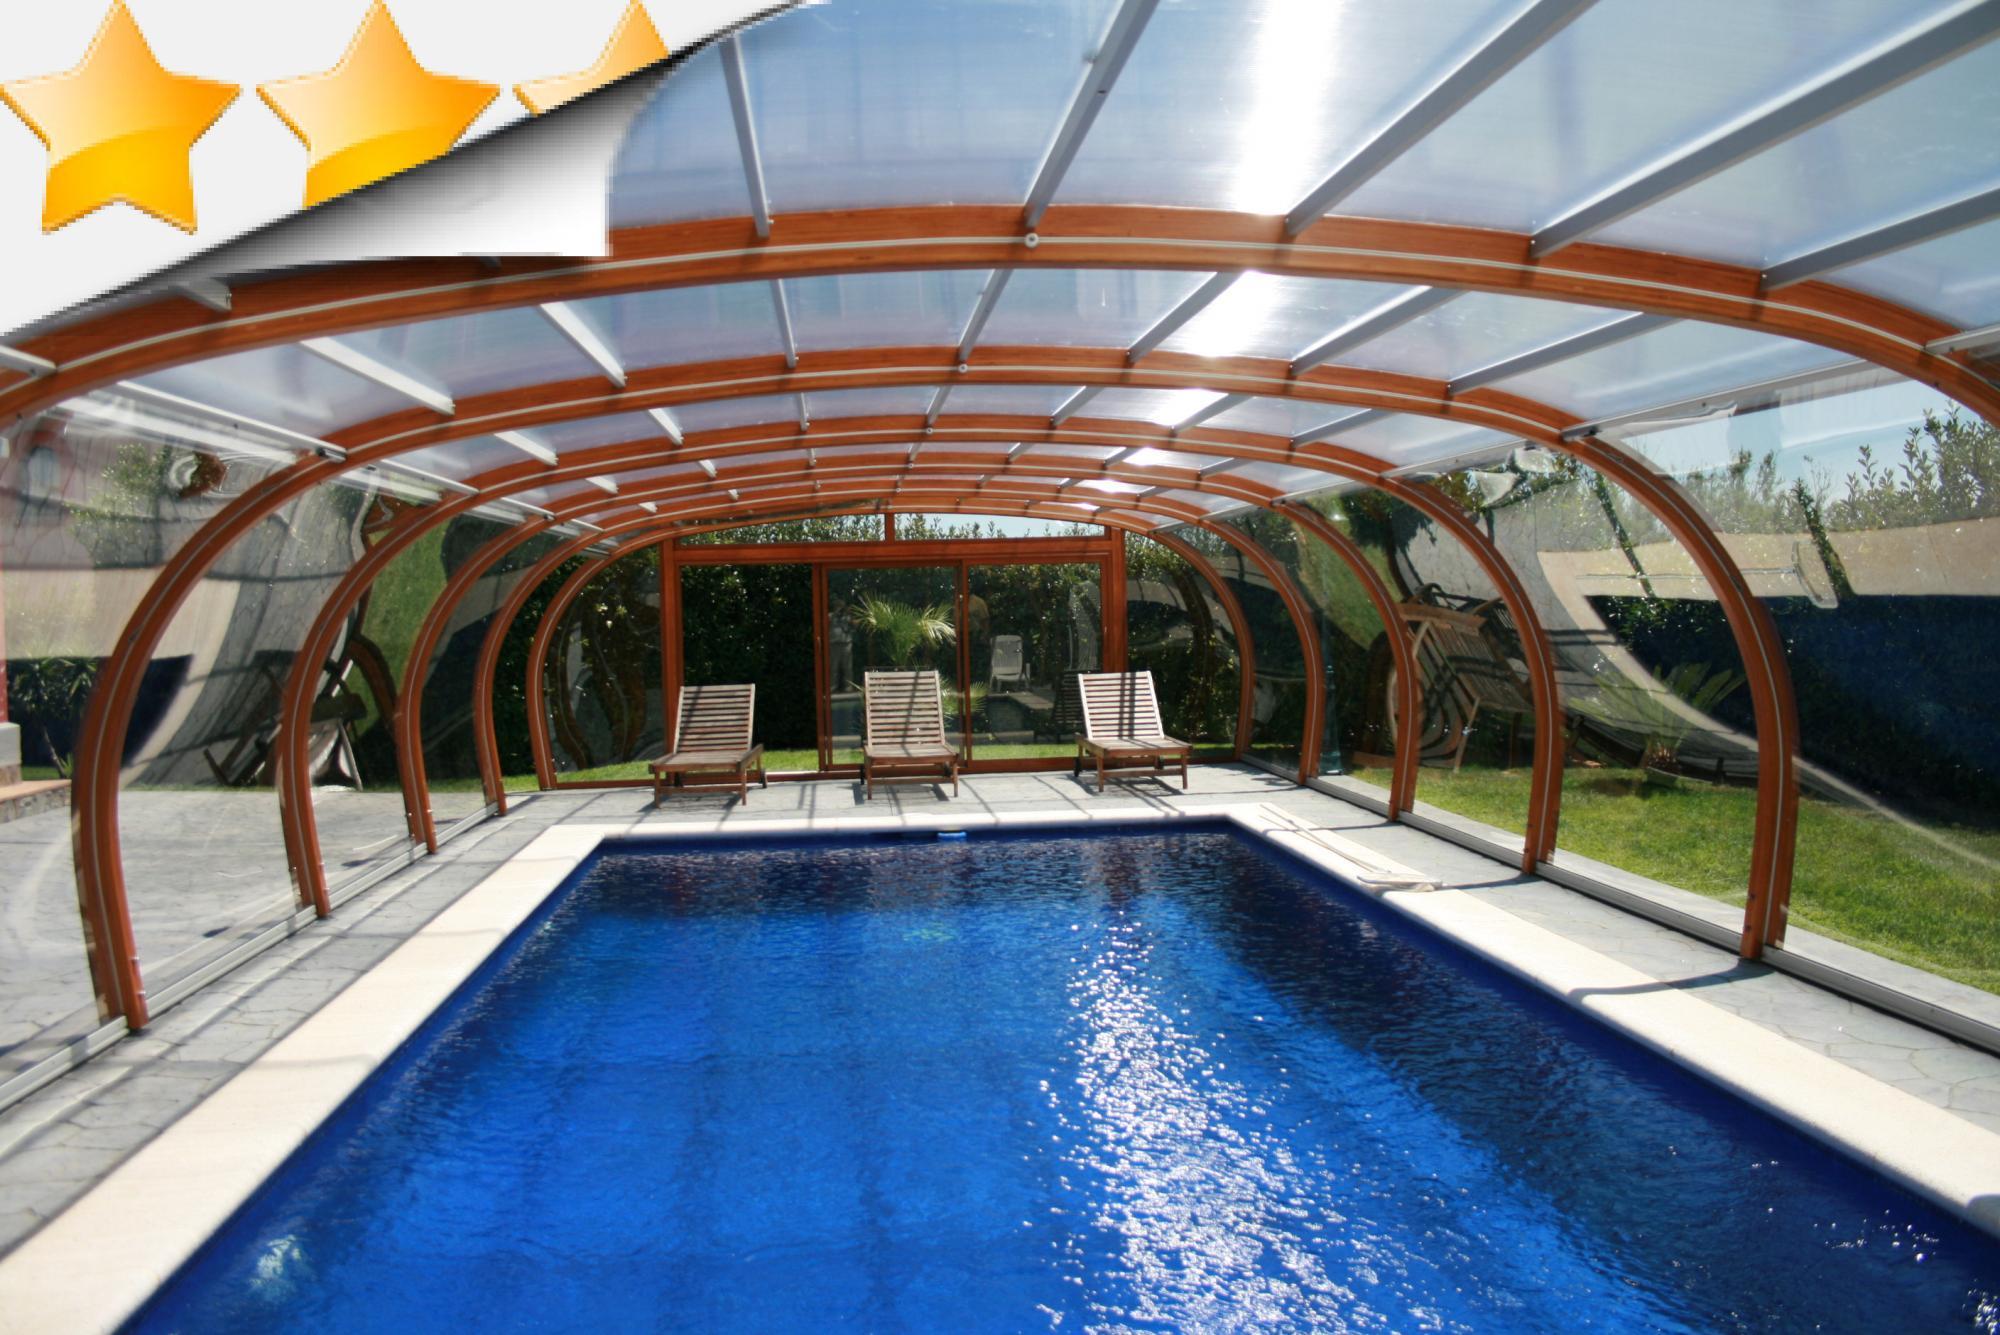 Vente abri de piscine par lpc for Abri de piscine espagne